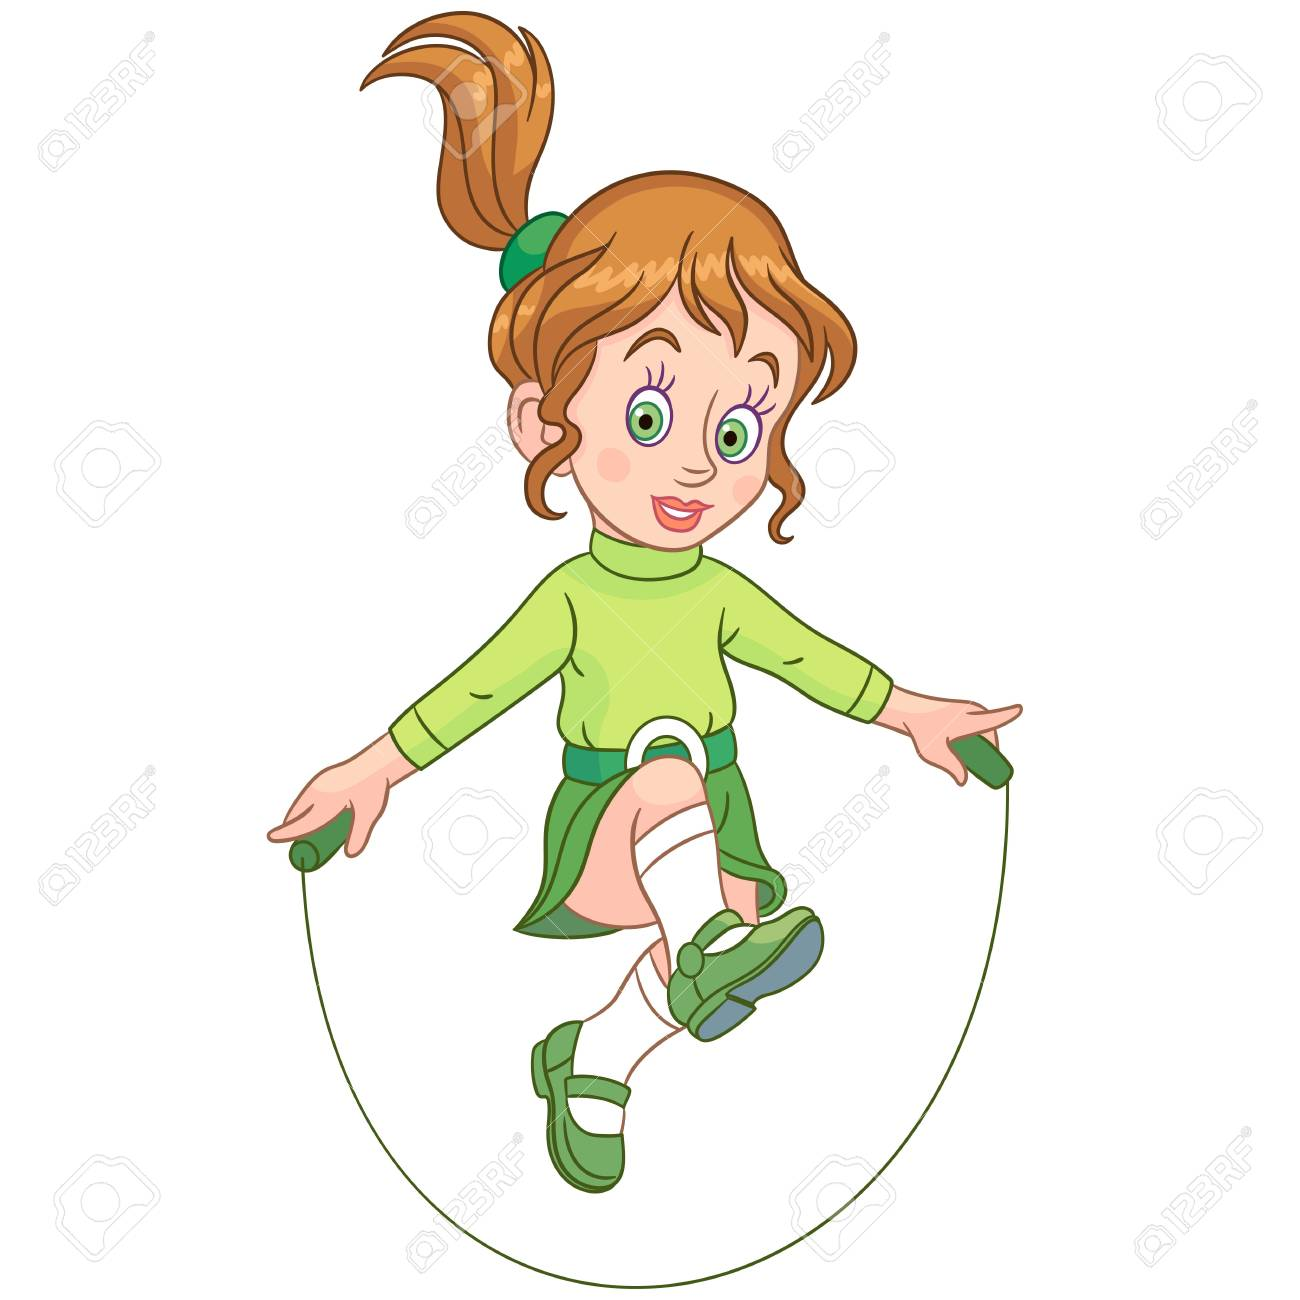 Actividades De Ocio Para Niños. Chica De Dibujos Animados Saltando ...